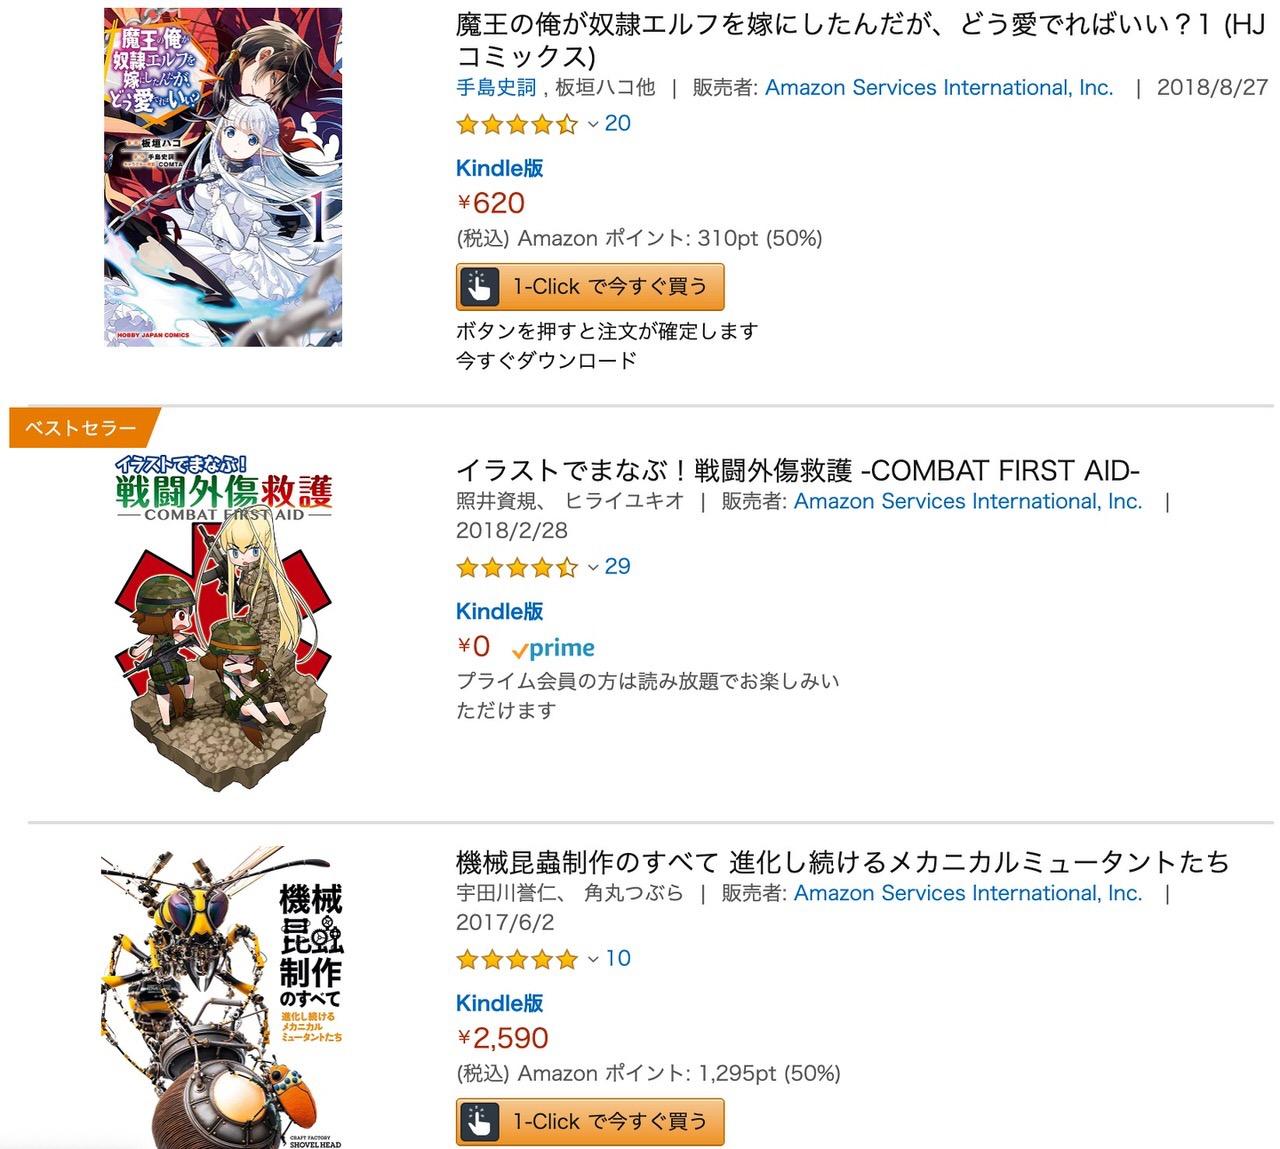 【Kindleセール】1,000冊以上が対象「ホビージャパンフェア」開催中(5/16まで)